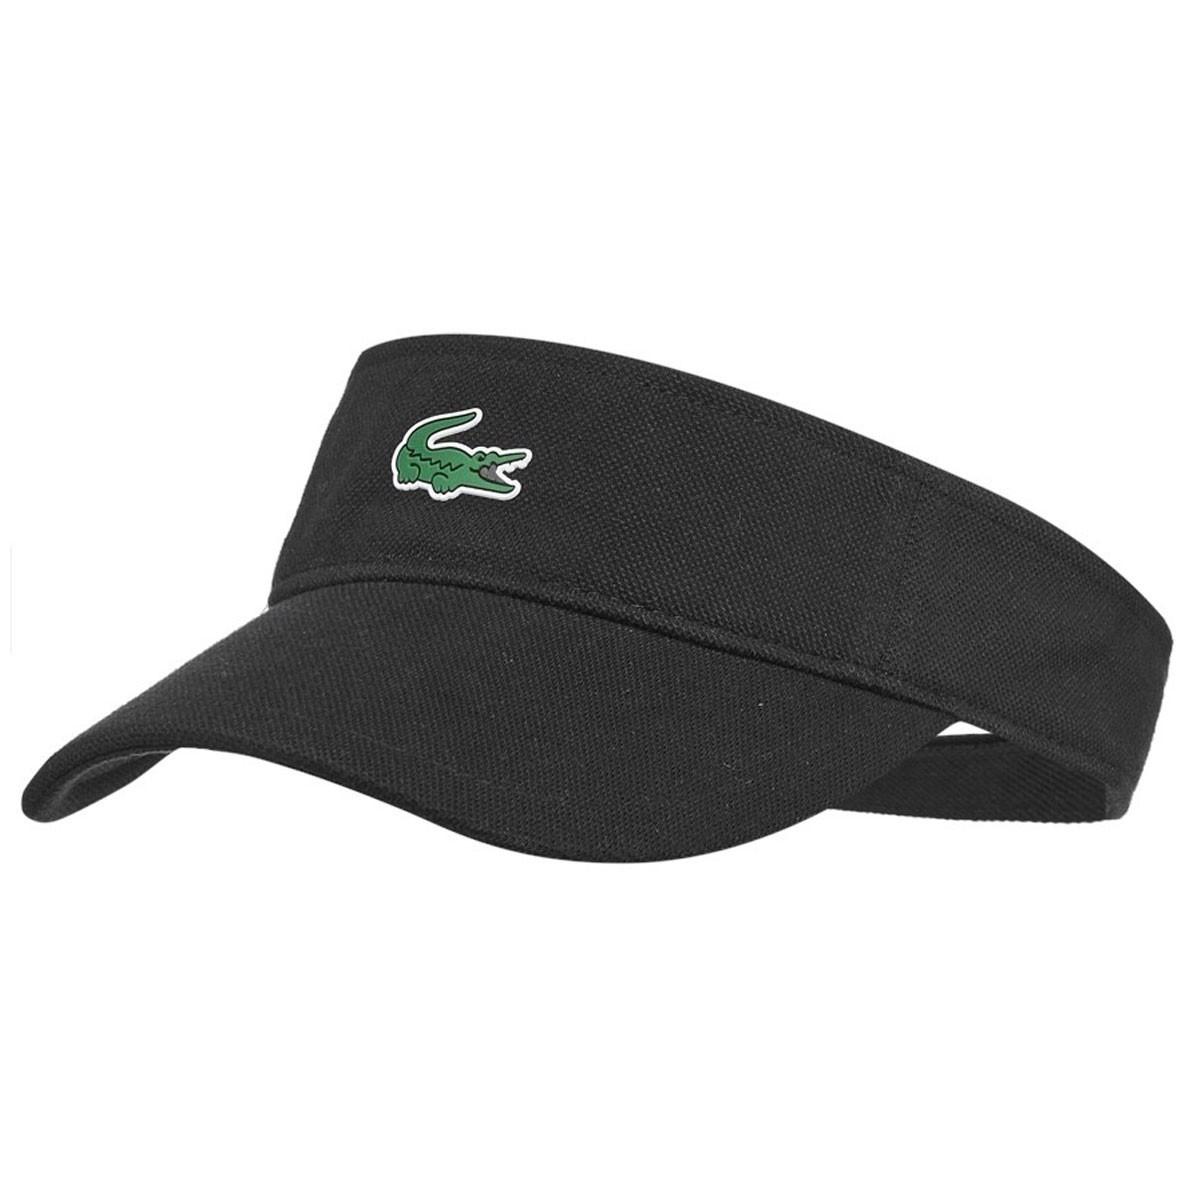 519ffabc1ee Lacoste Mens RK3553 Adjustable Pique Cotton Visor Golf Cap